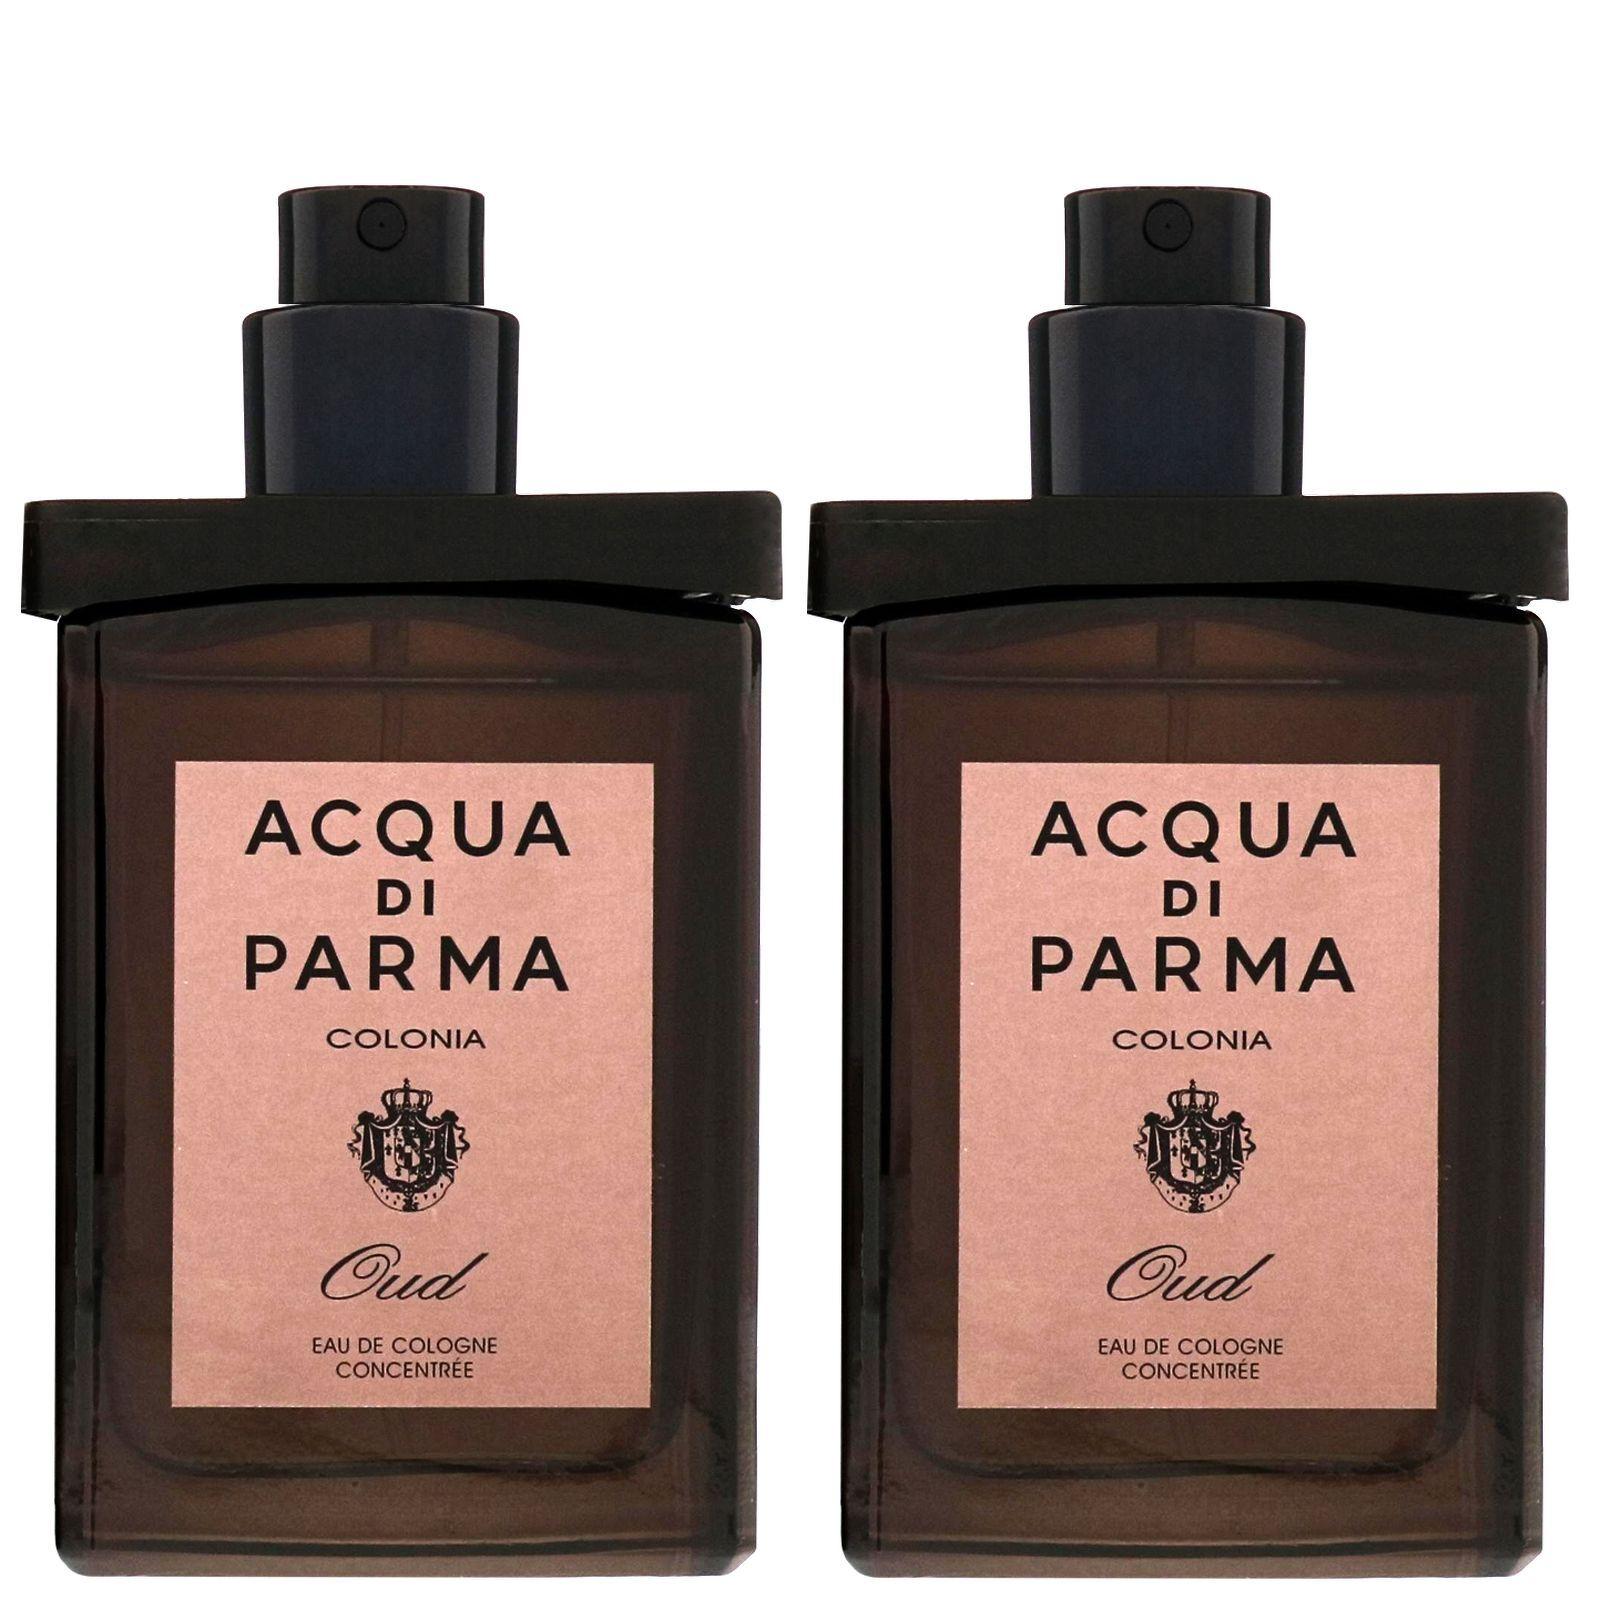 Acqua di Parma Colonia Oud 30ml Eau de Cologne Concentree Travel Spray ricarica 2 x